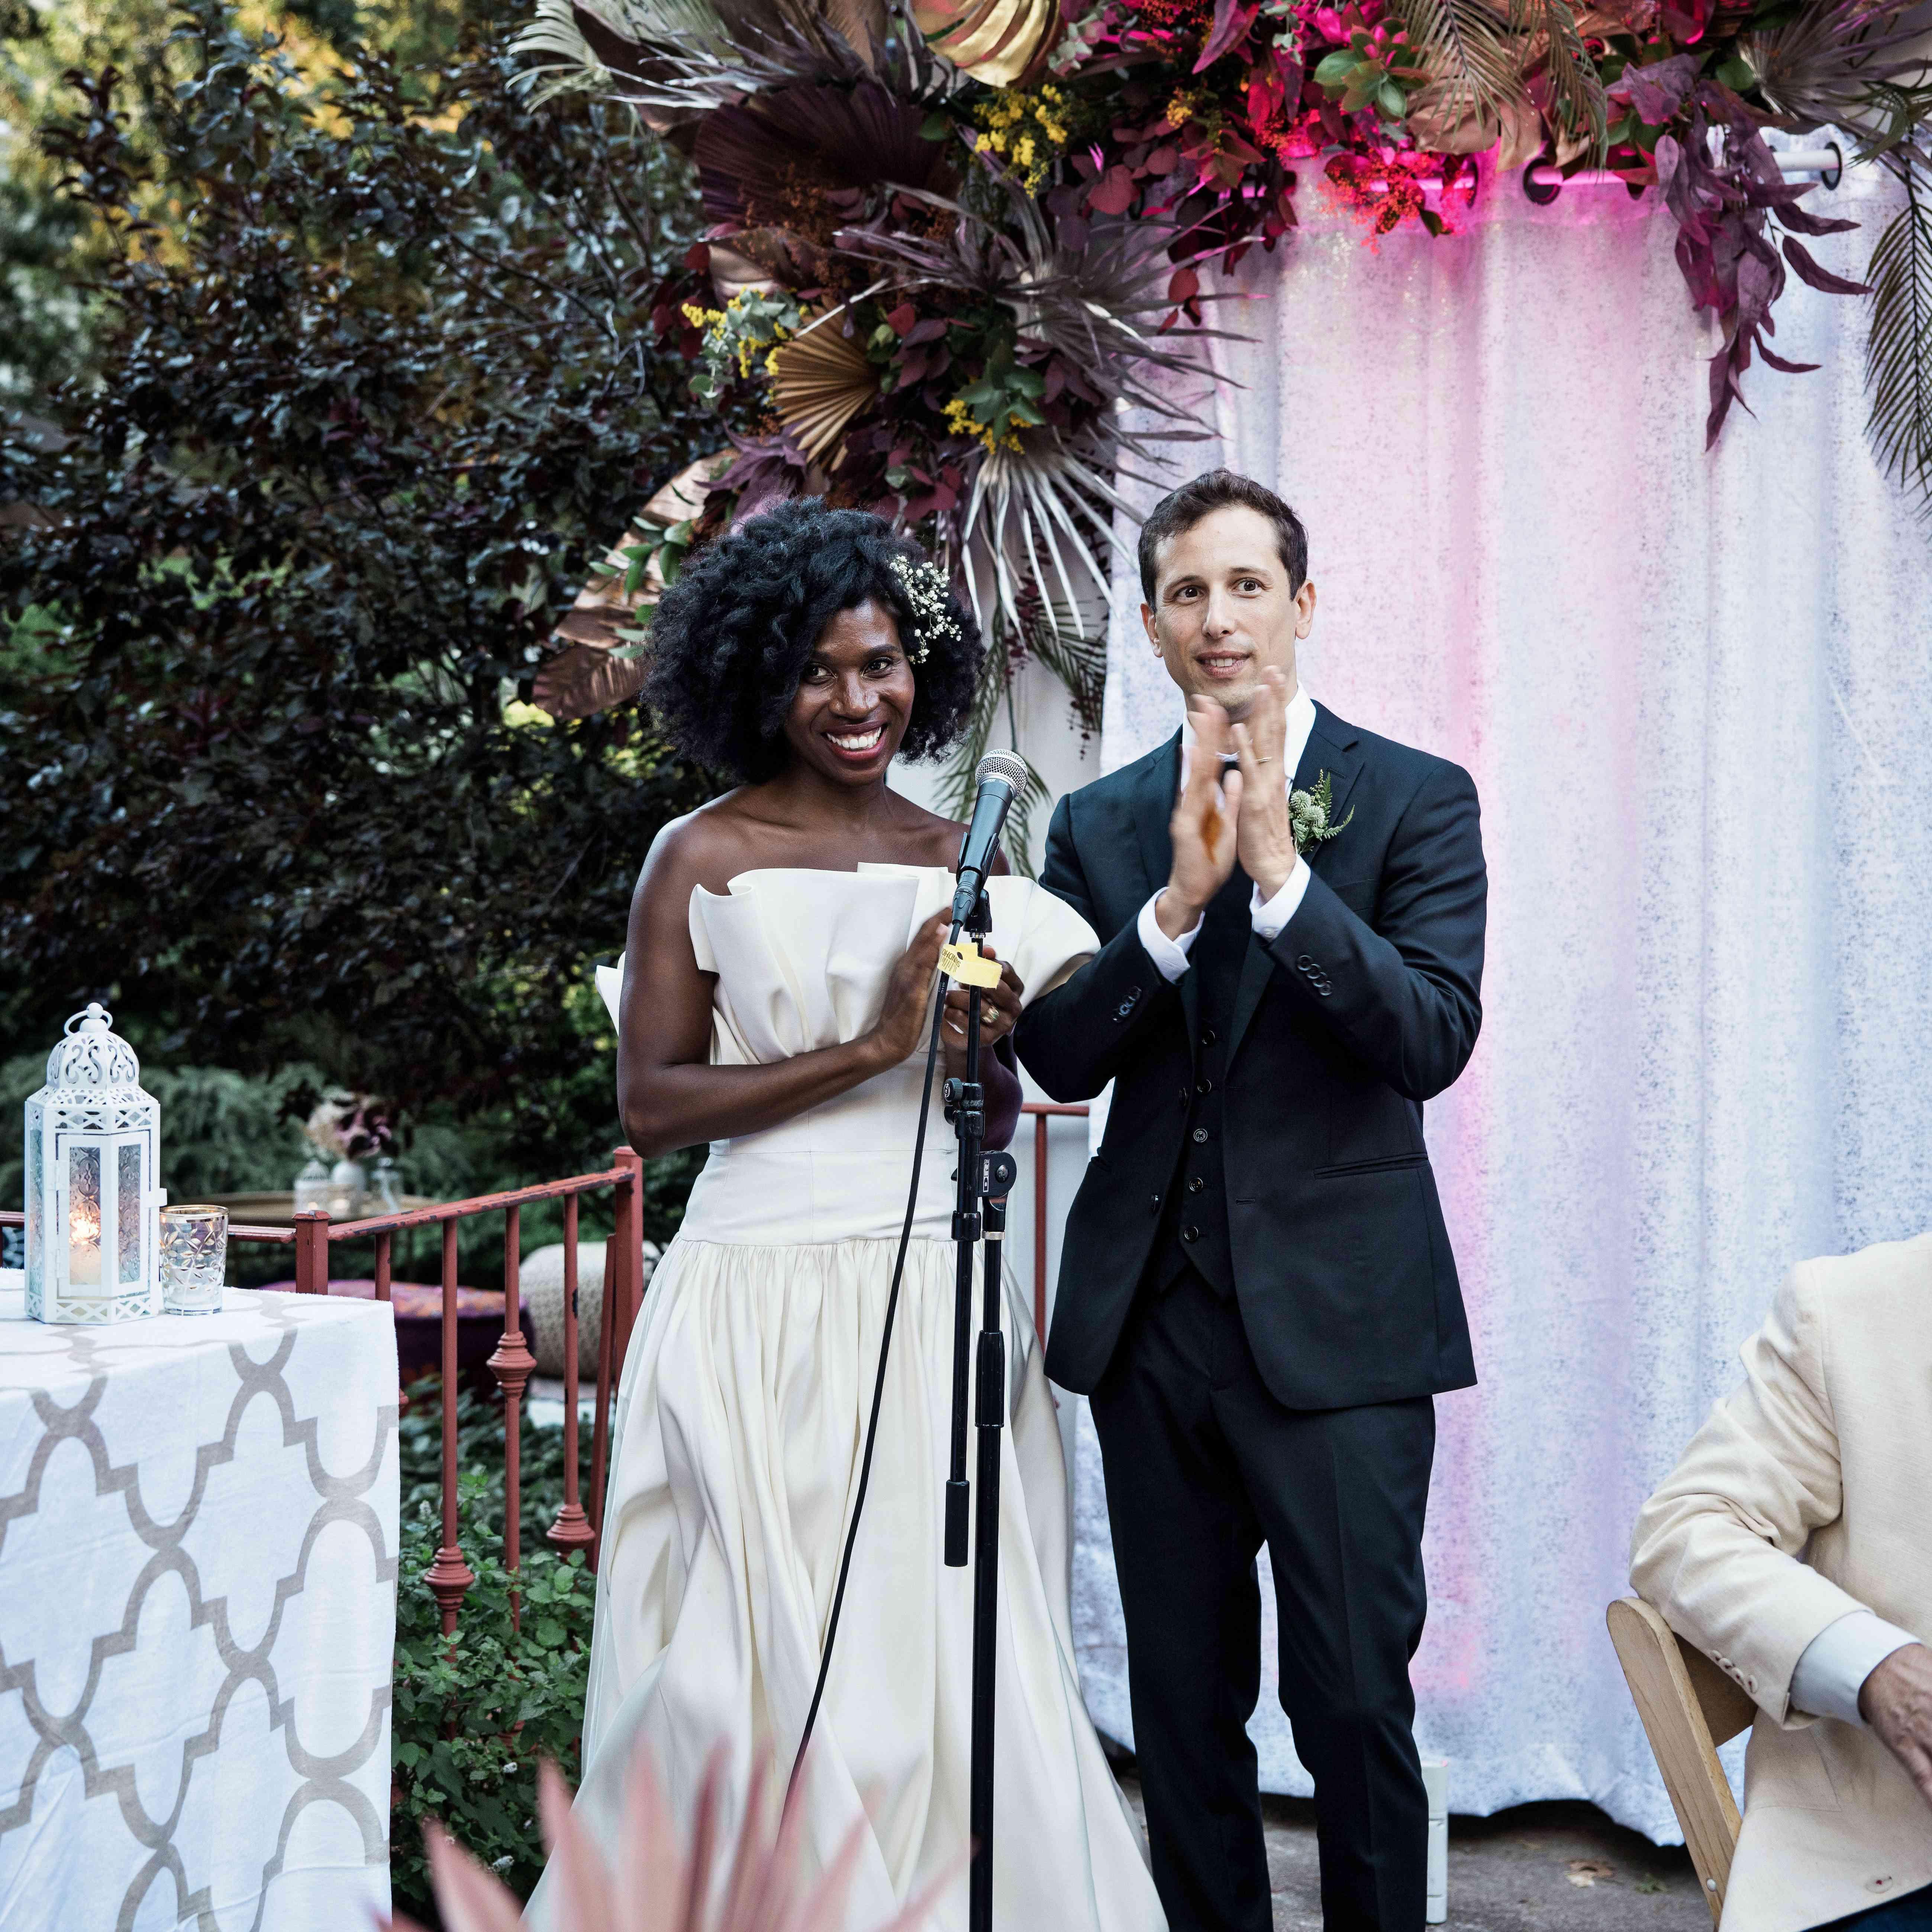 The couple make a speech